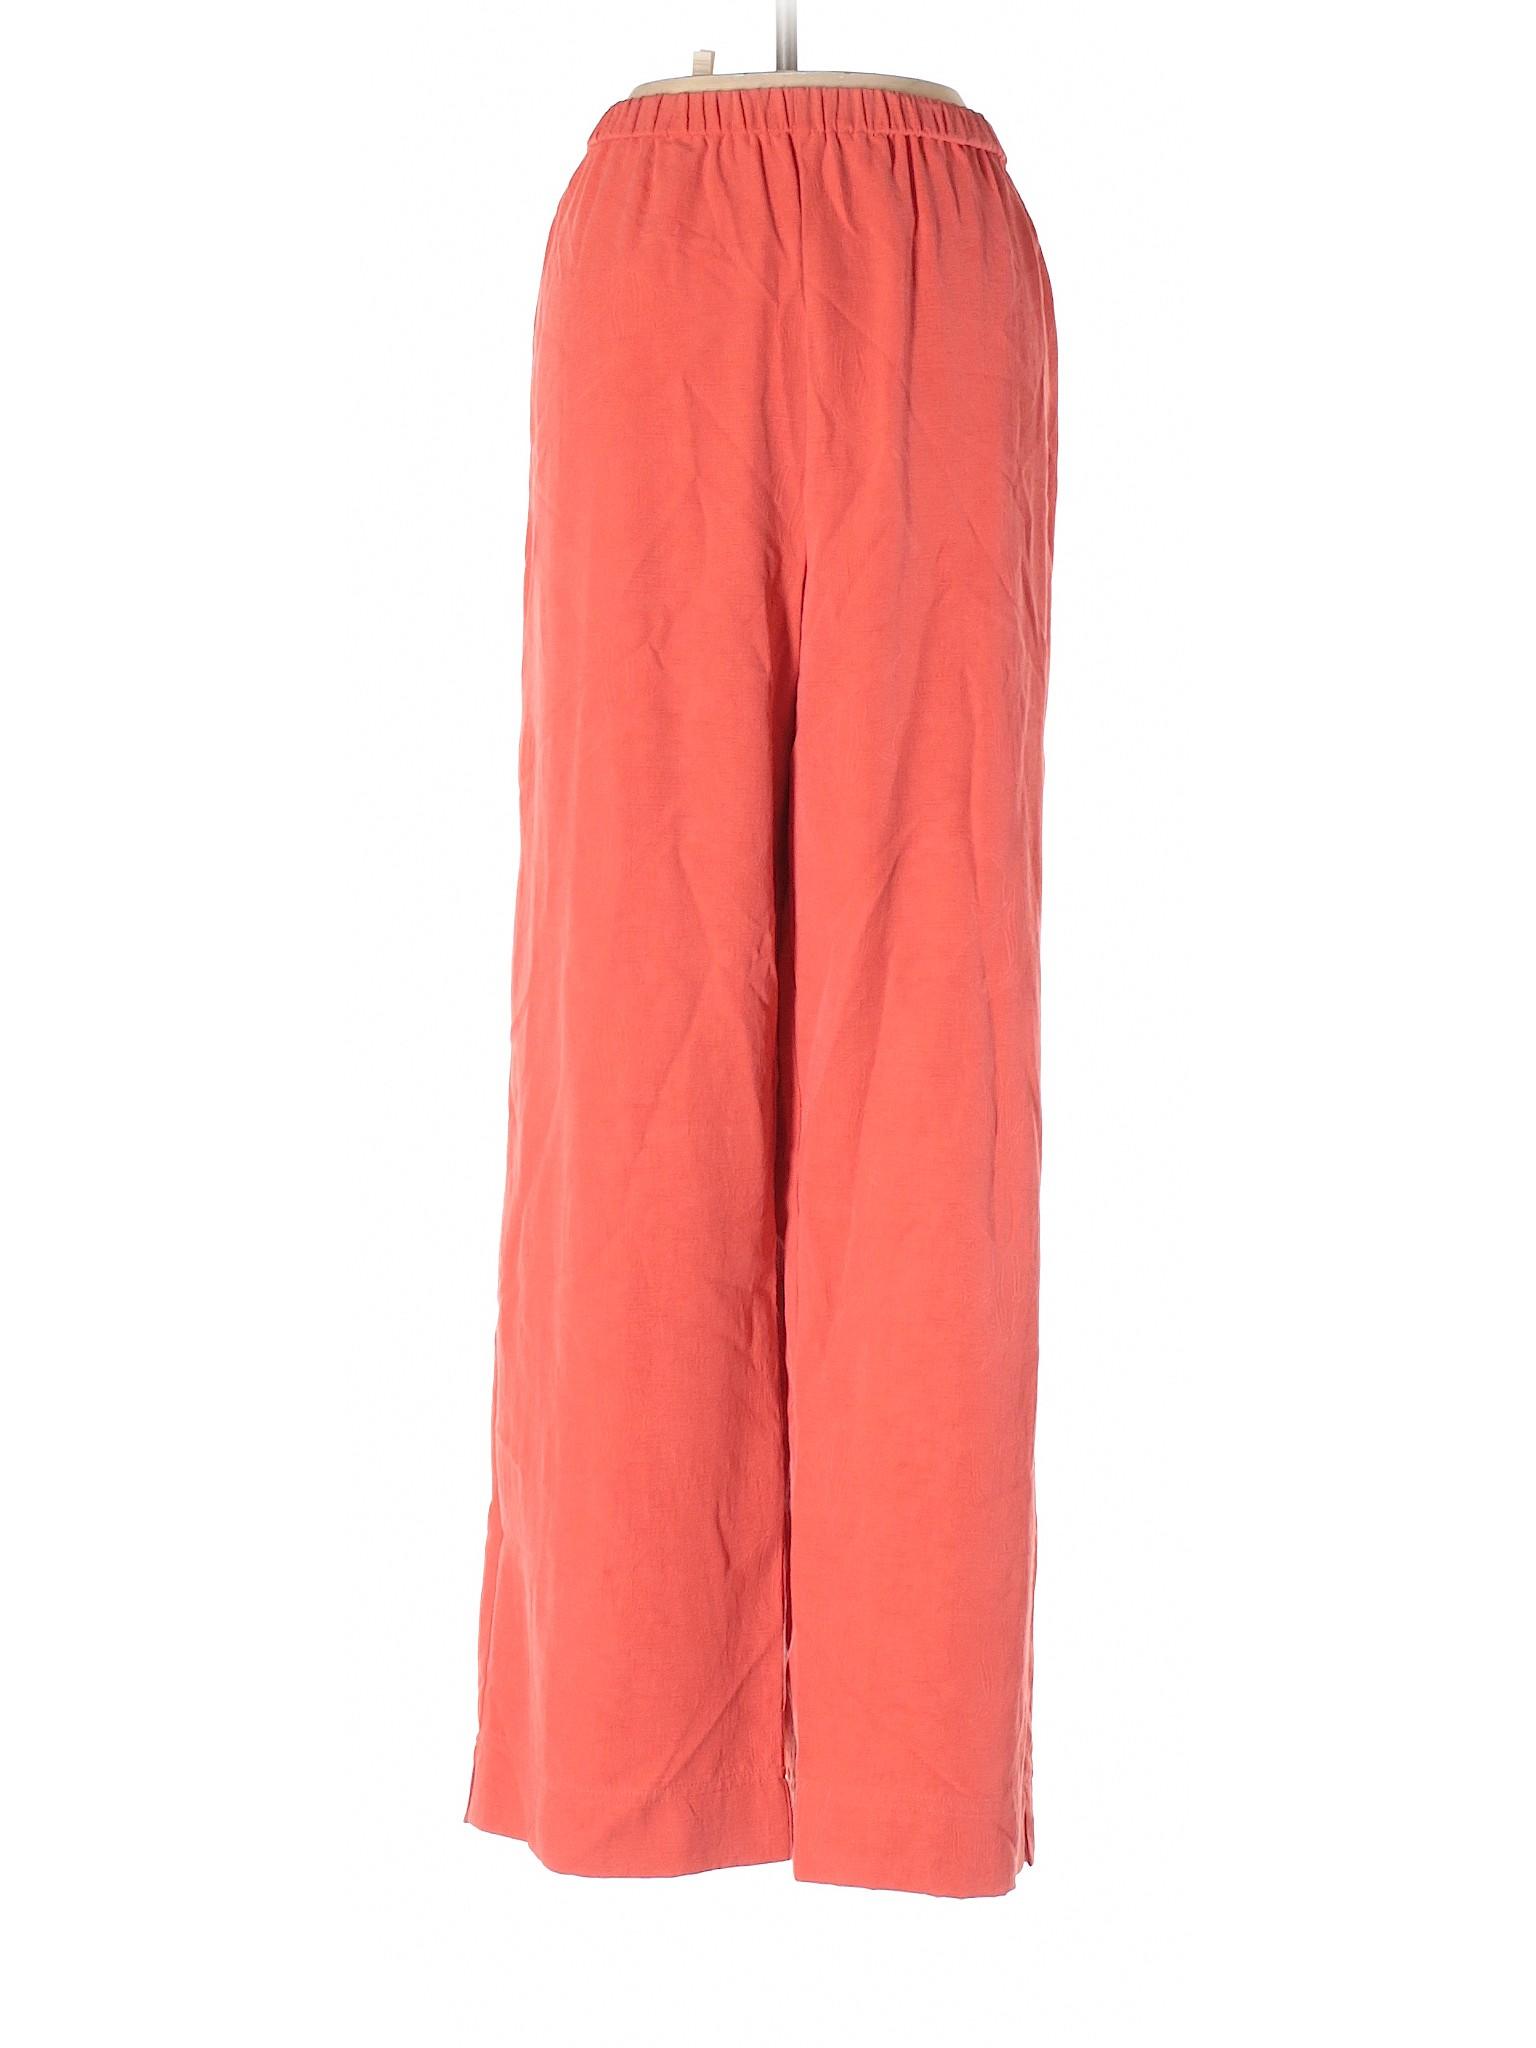 Boutique winter Boutique winter Chico's Chico's Silk Silk Pants Pants Boutique tpwSq65